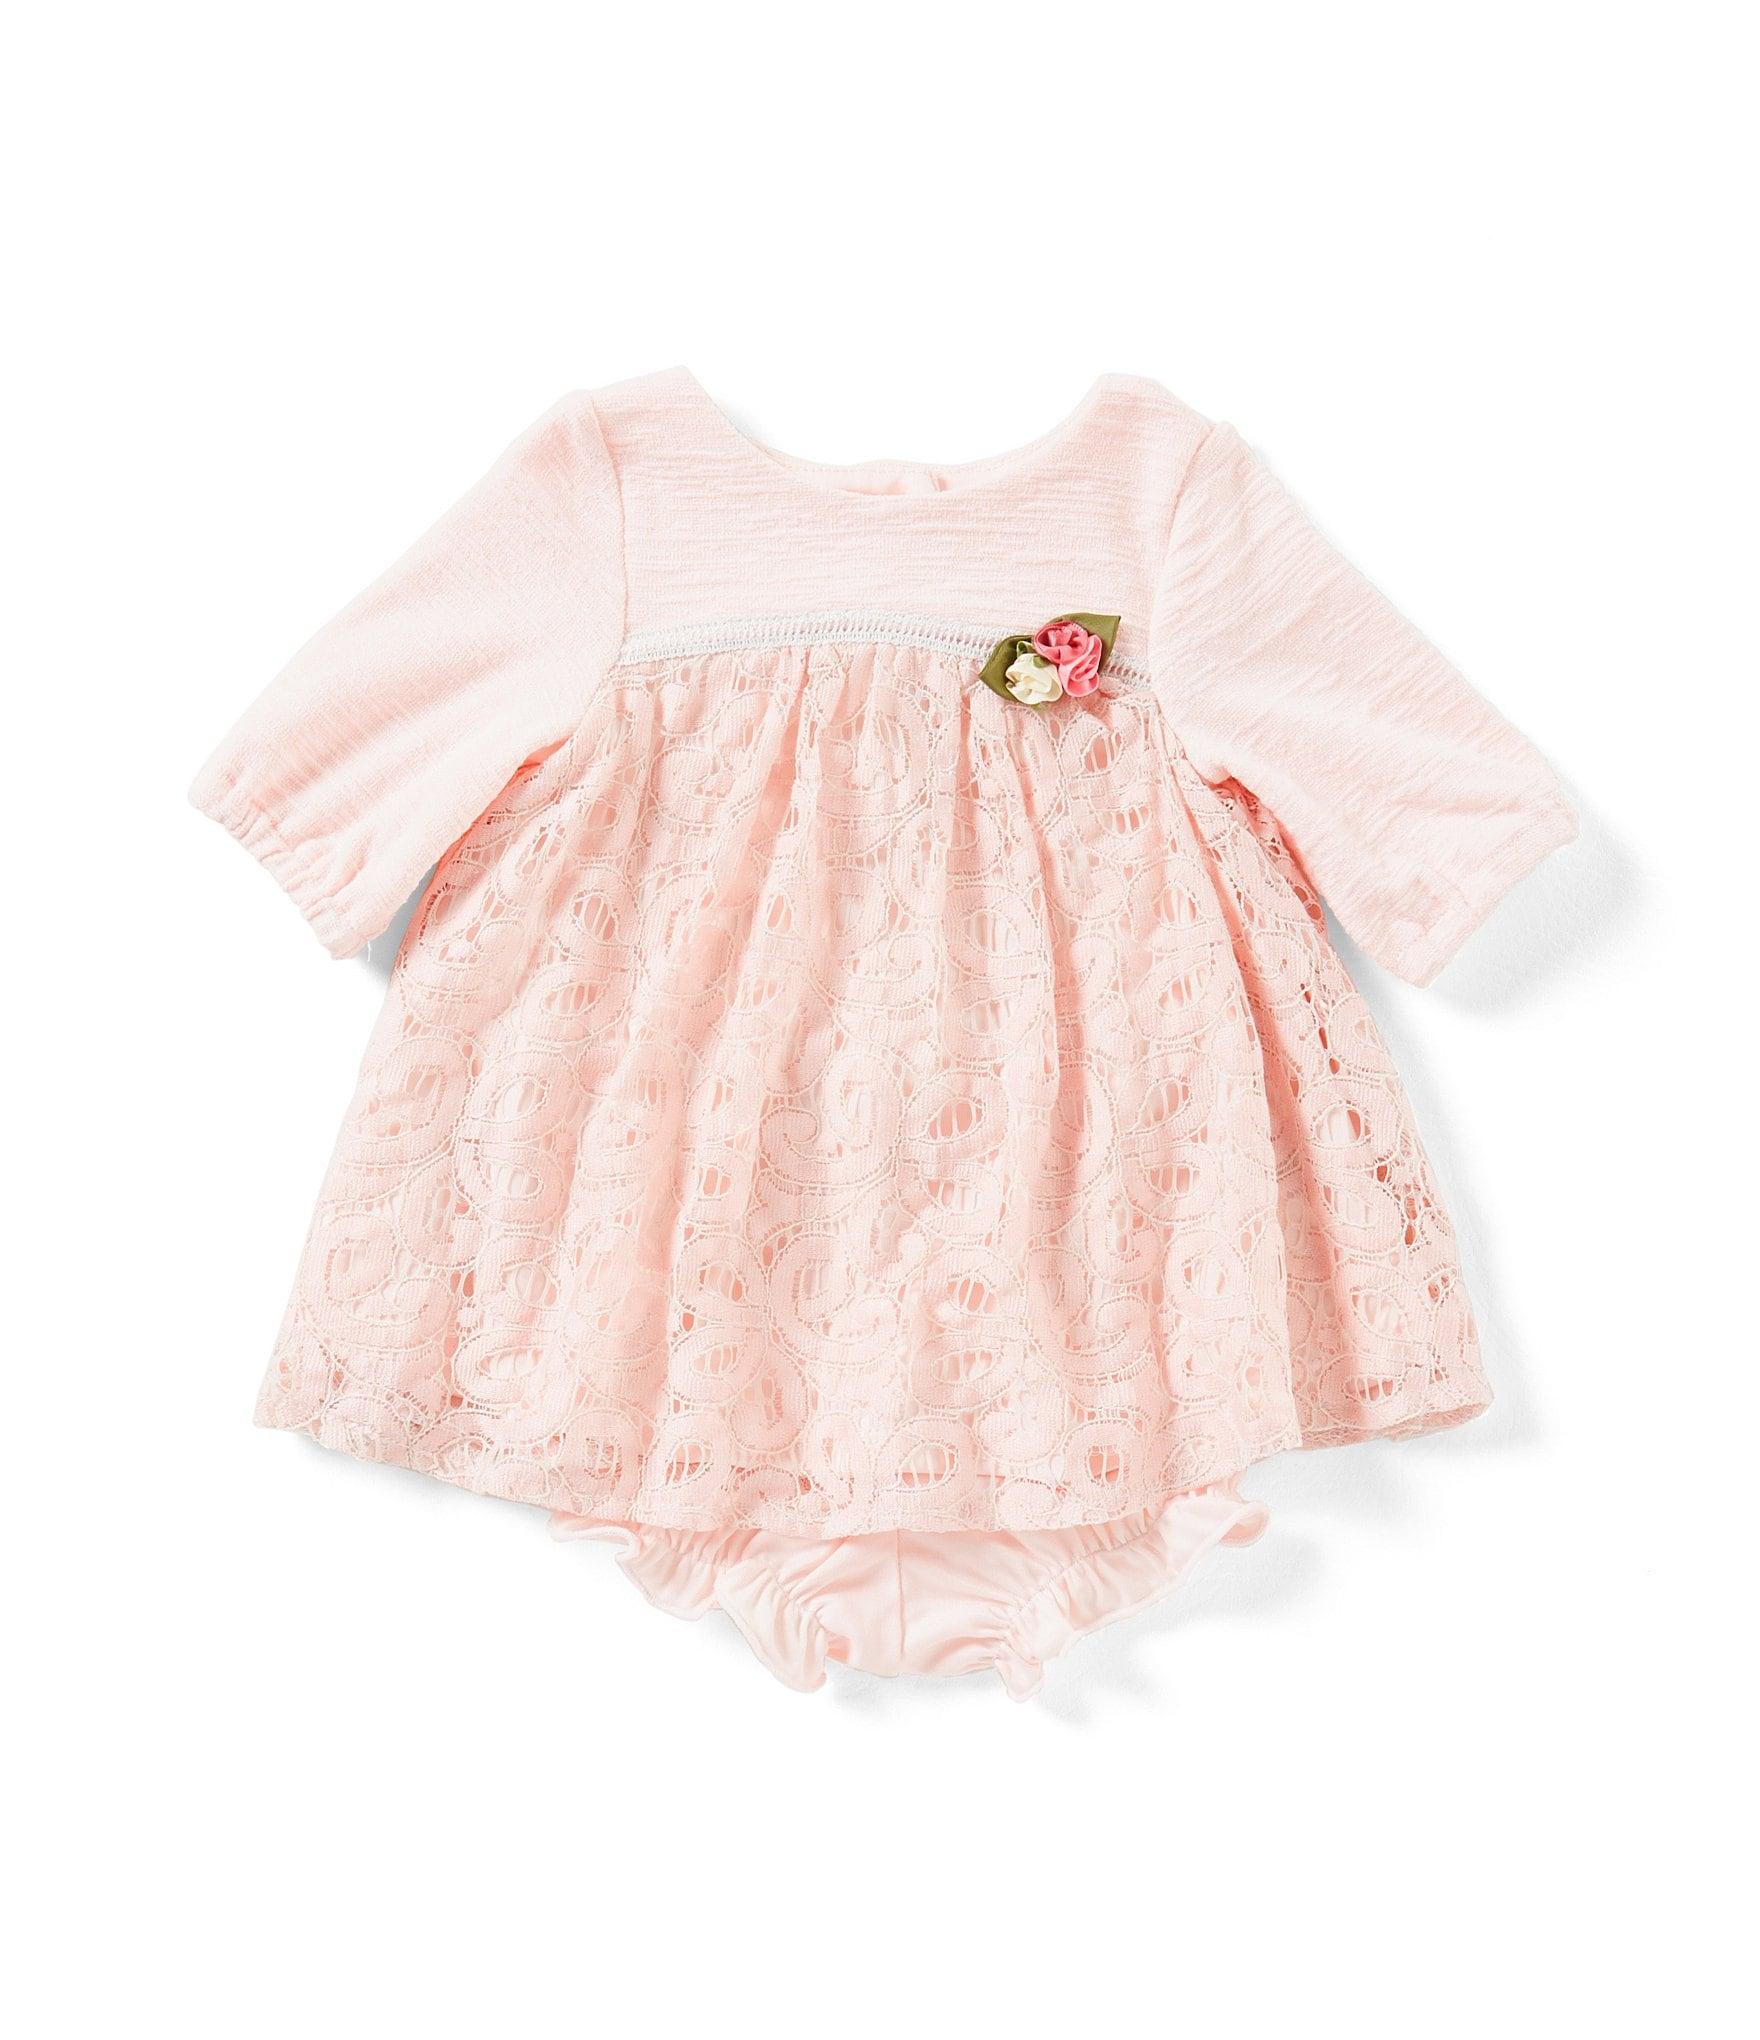 Laura Ashley London Baby Girls Newborn 24 Months Lace 3 4